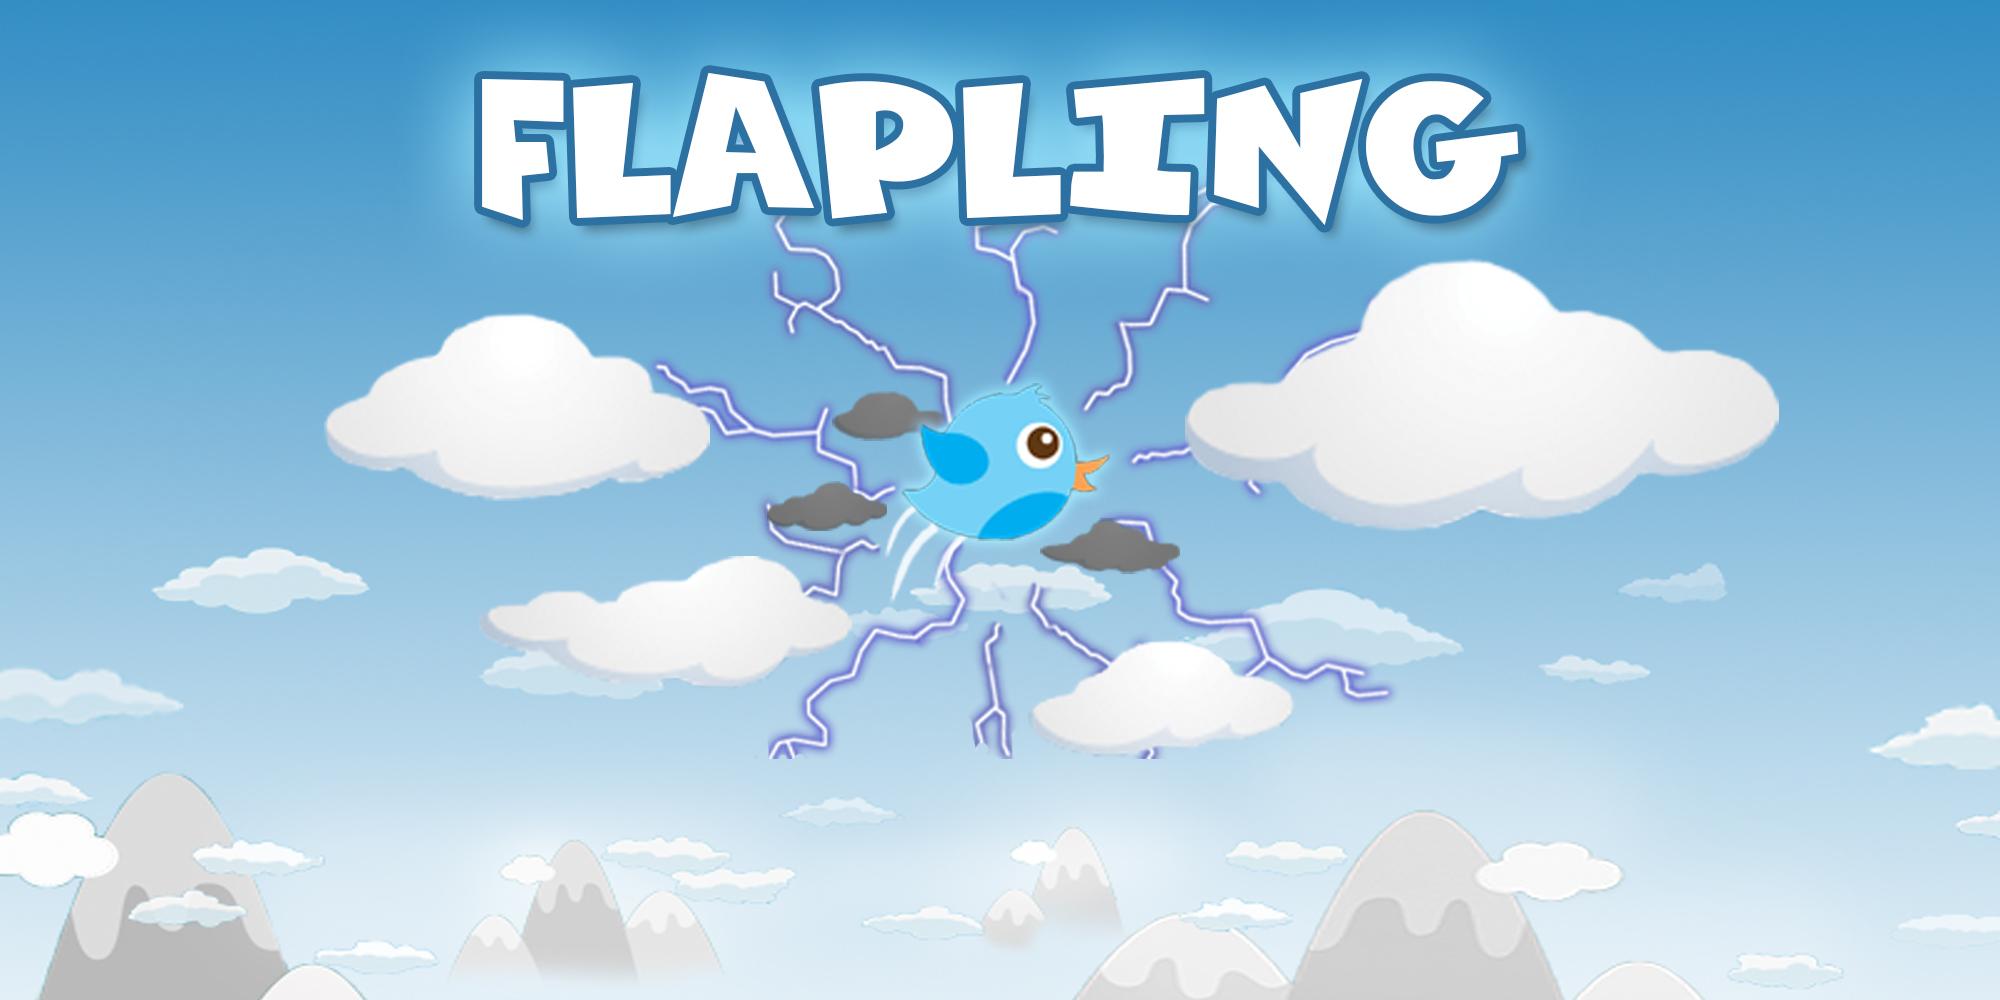 Flapling